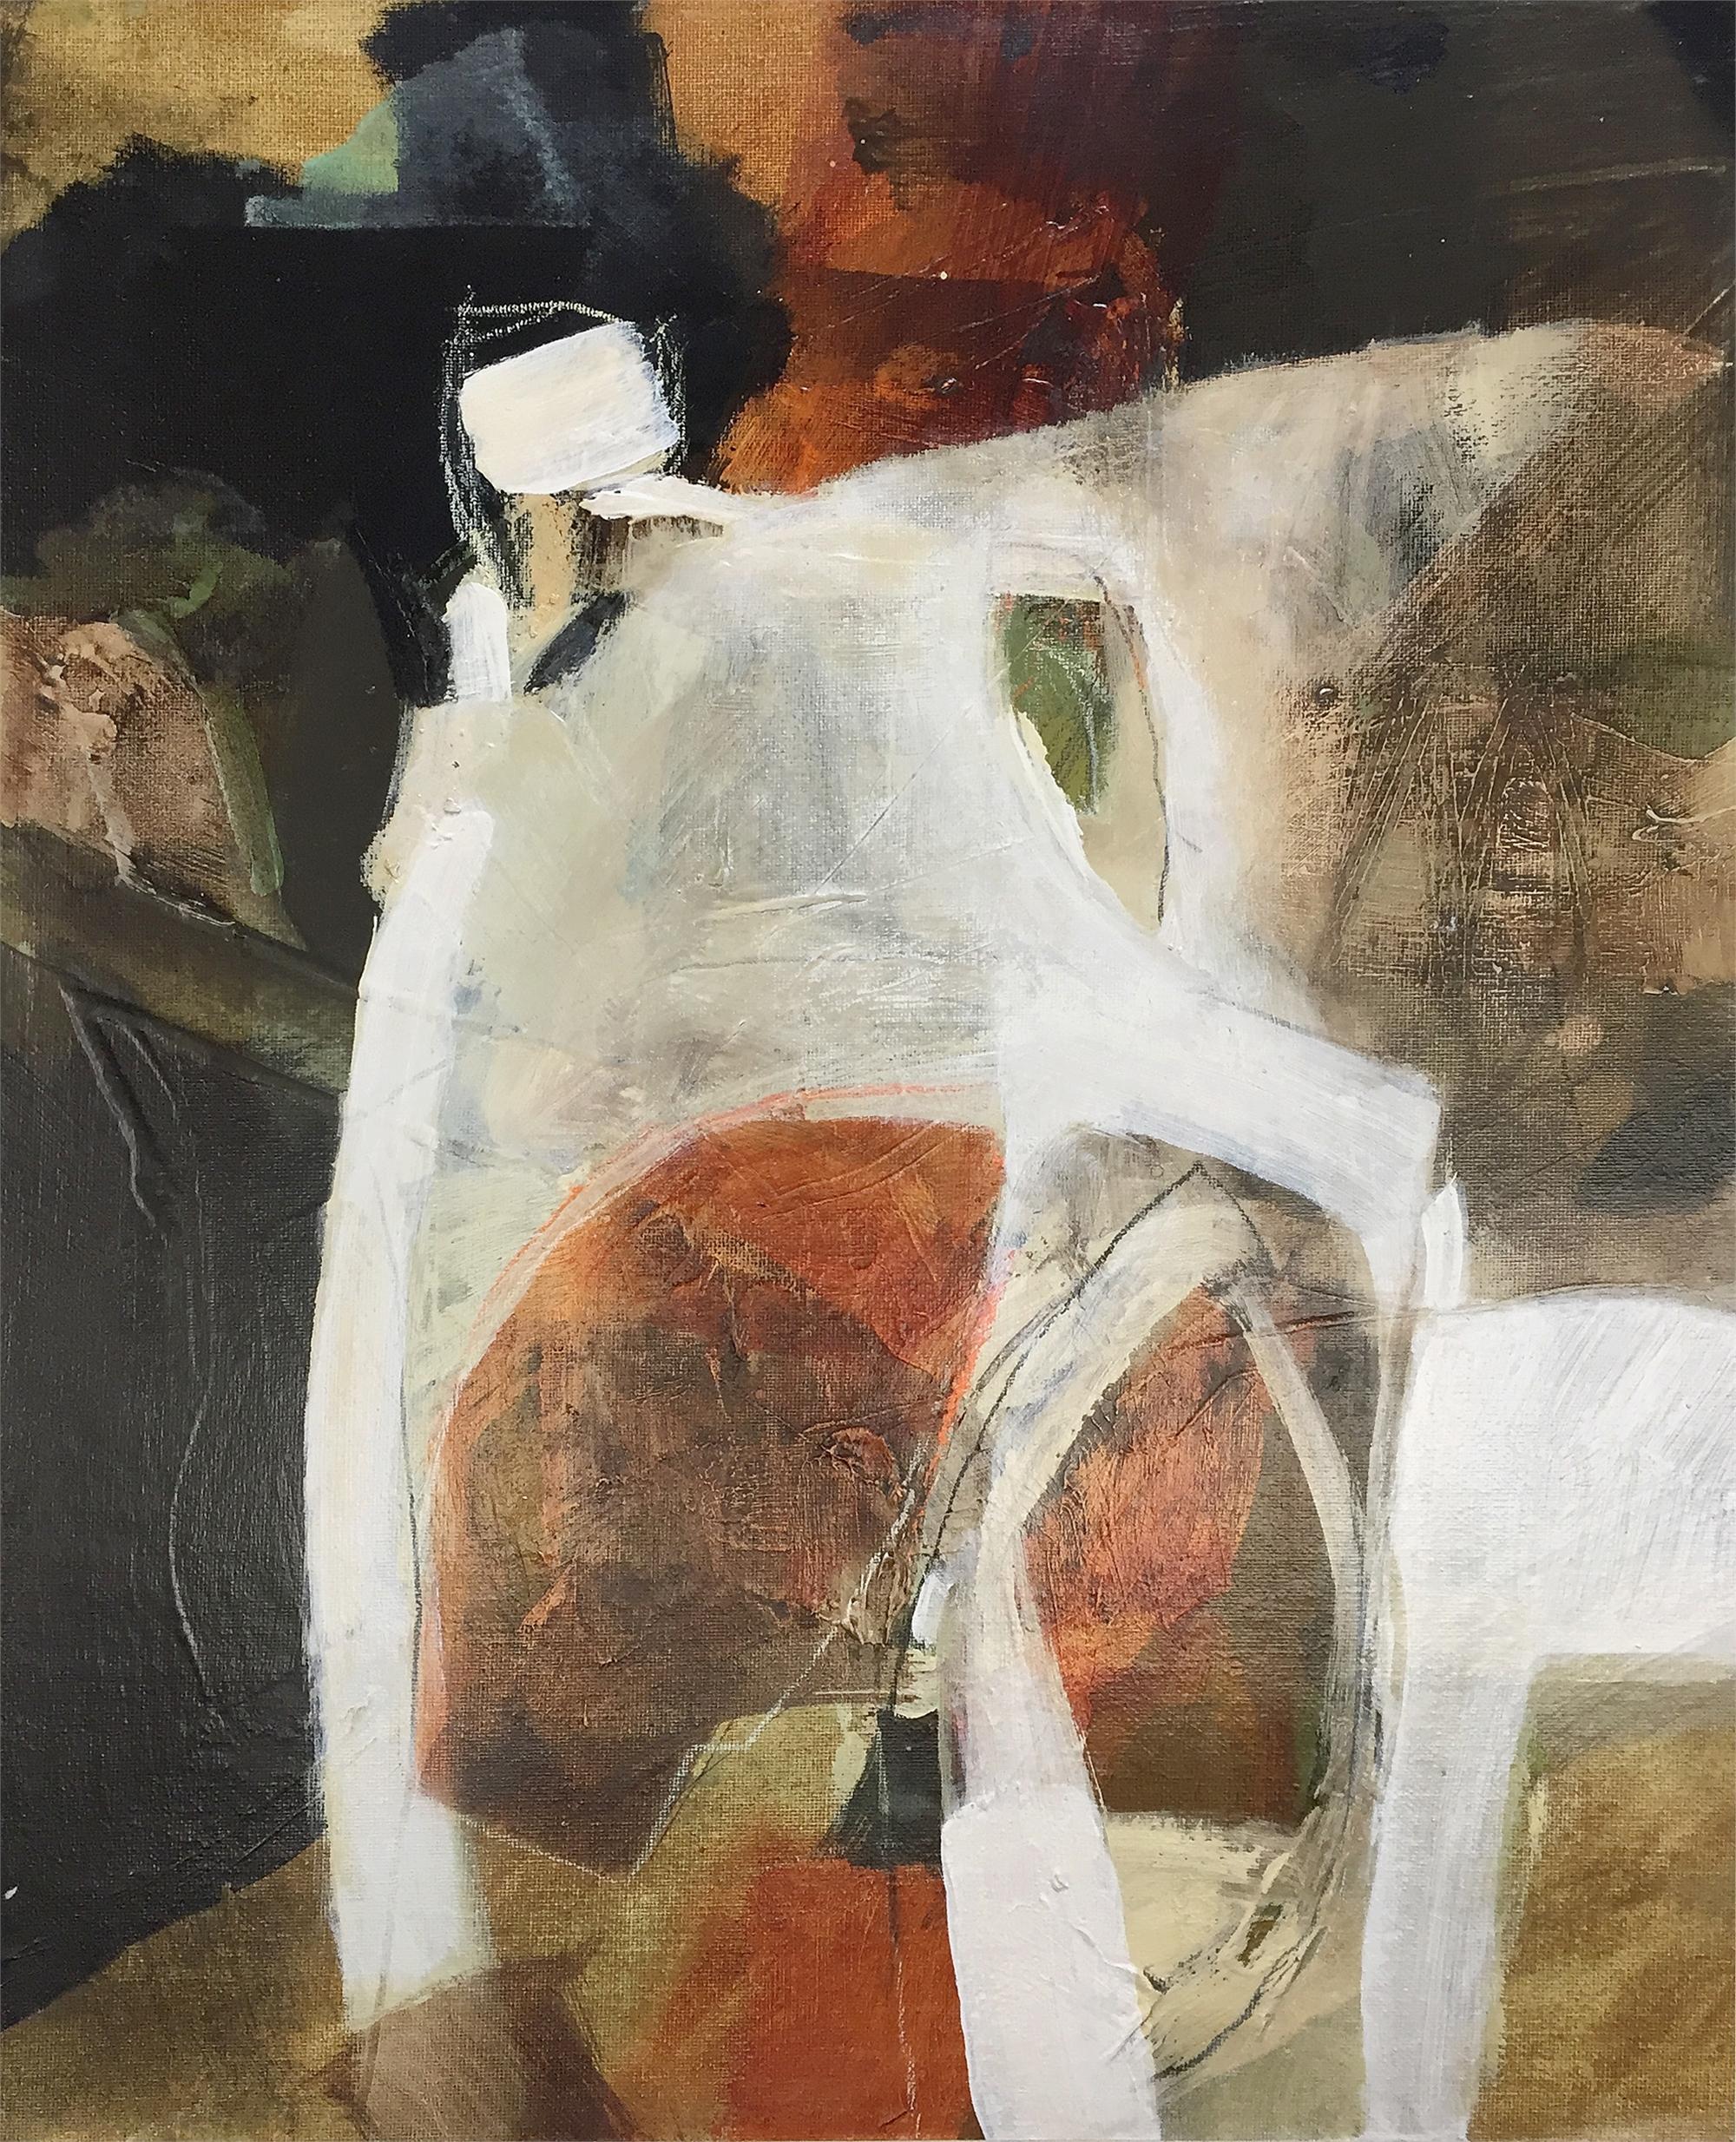 Untitled 198585 by Karen Roehl